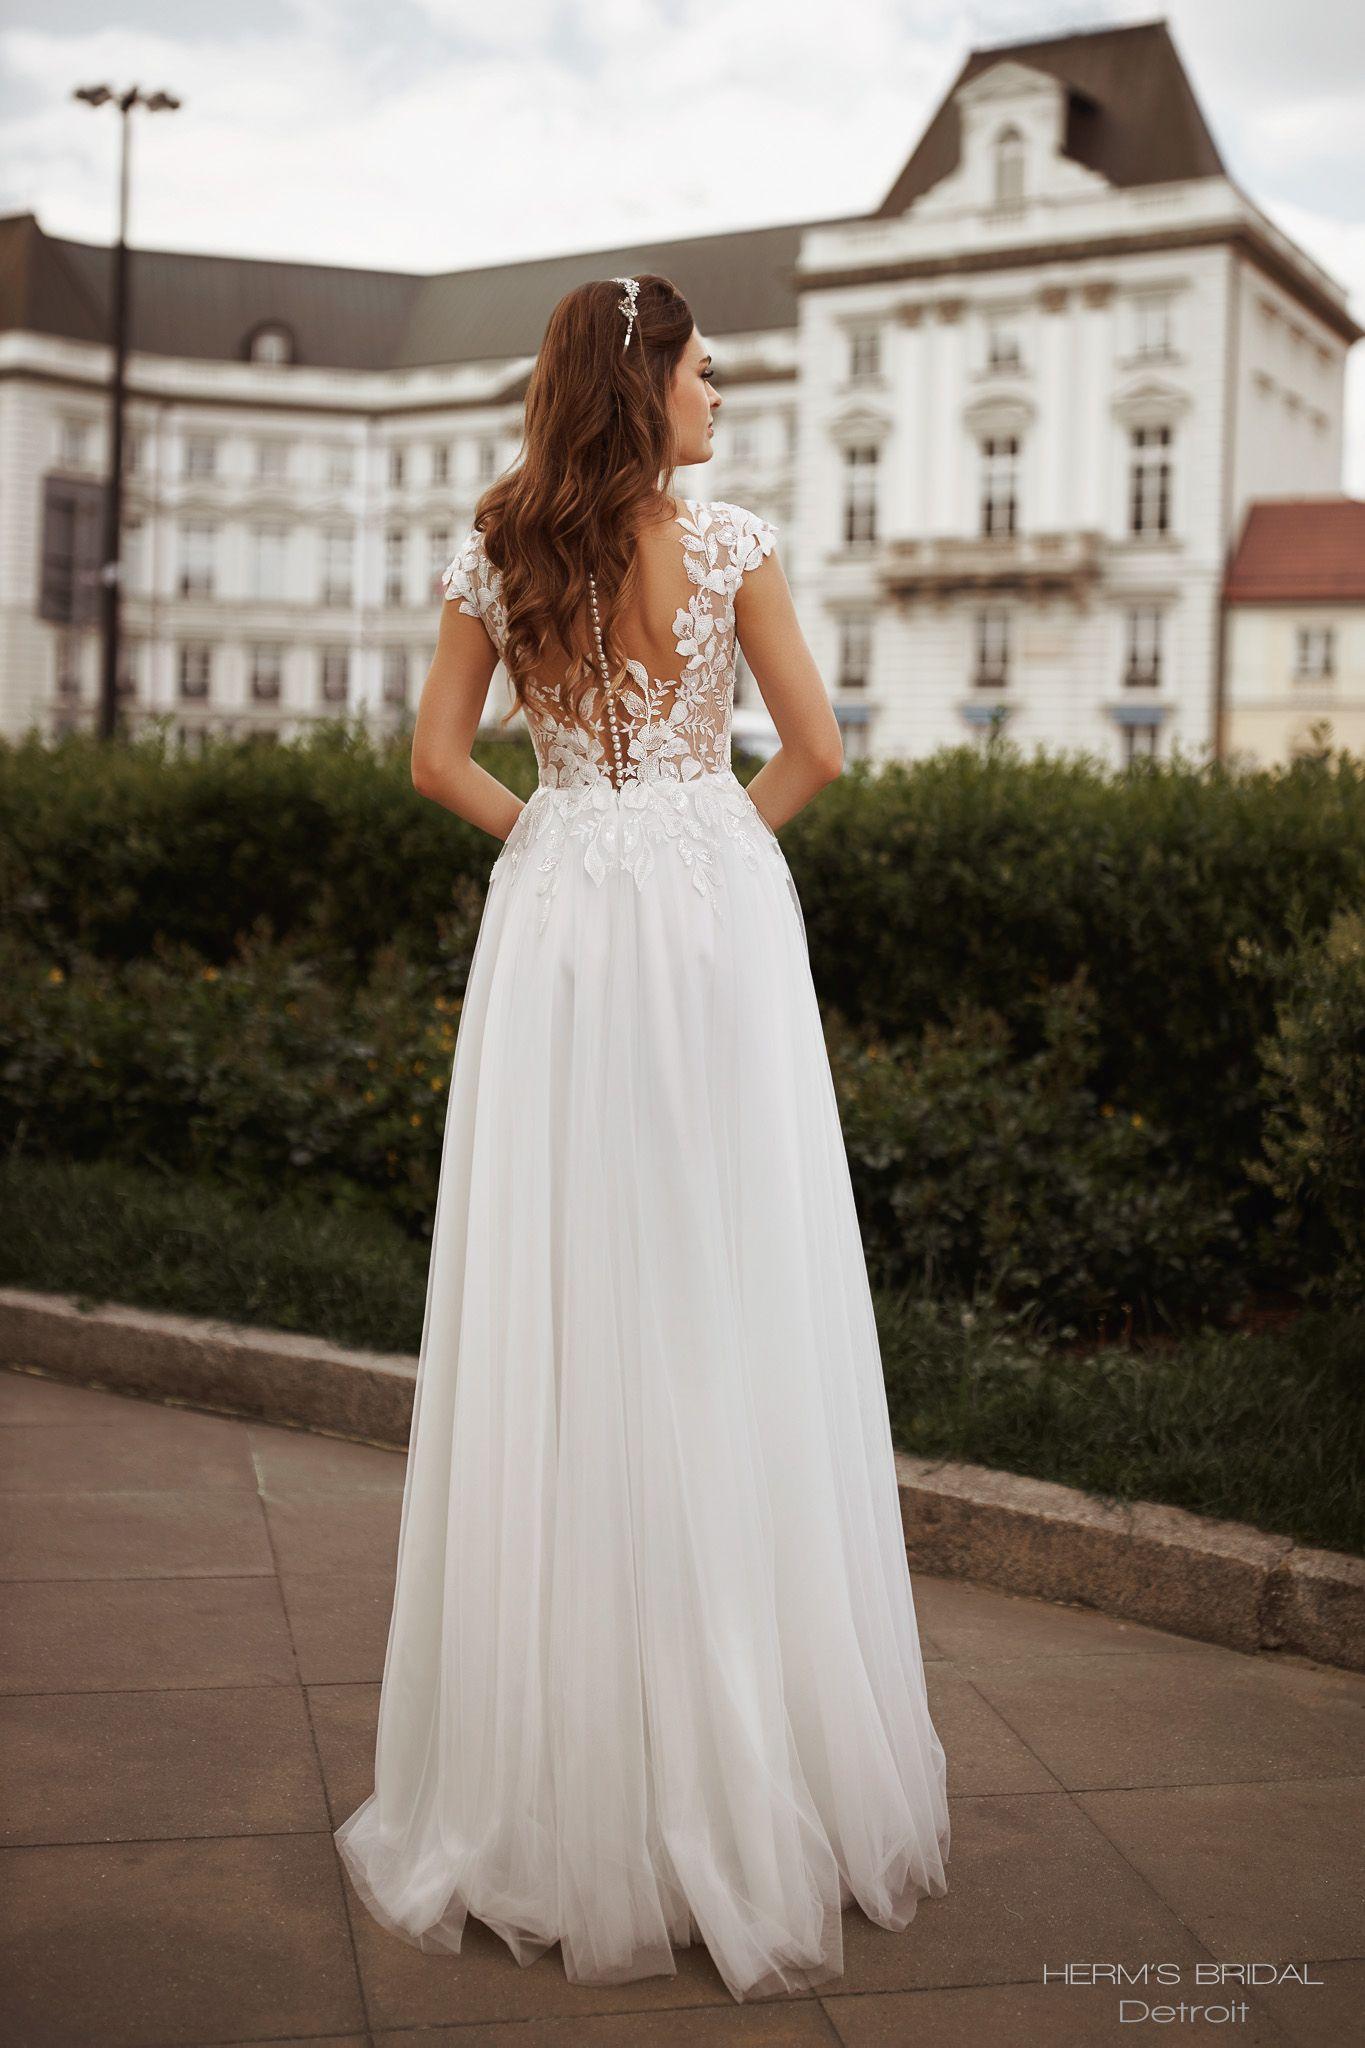 suknia slubna herms bridal Detroit 2